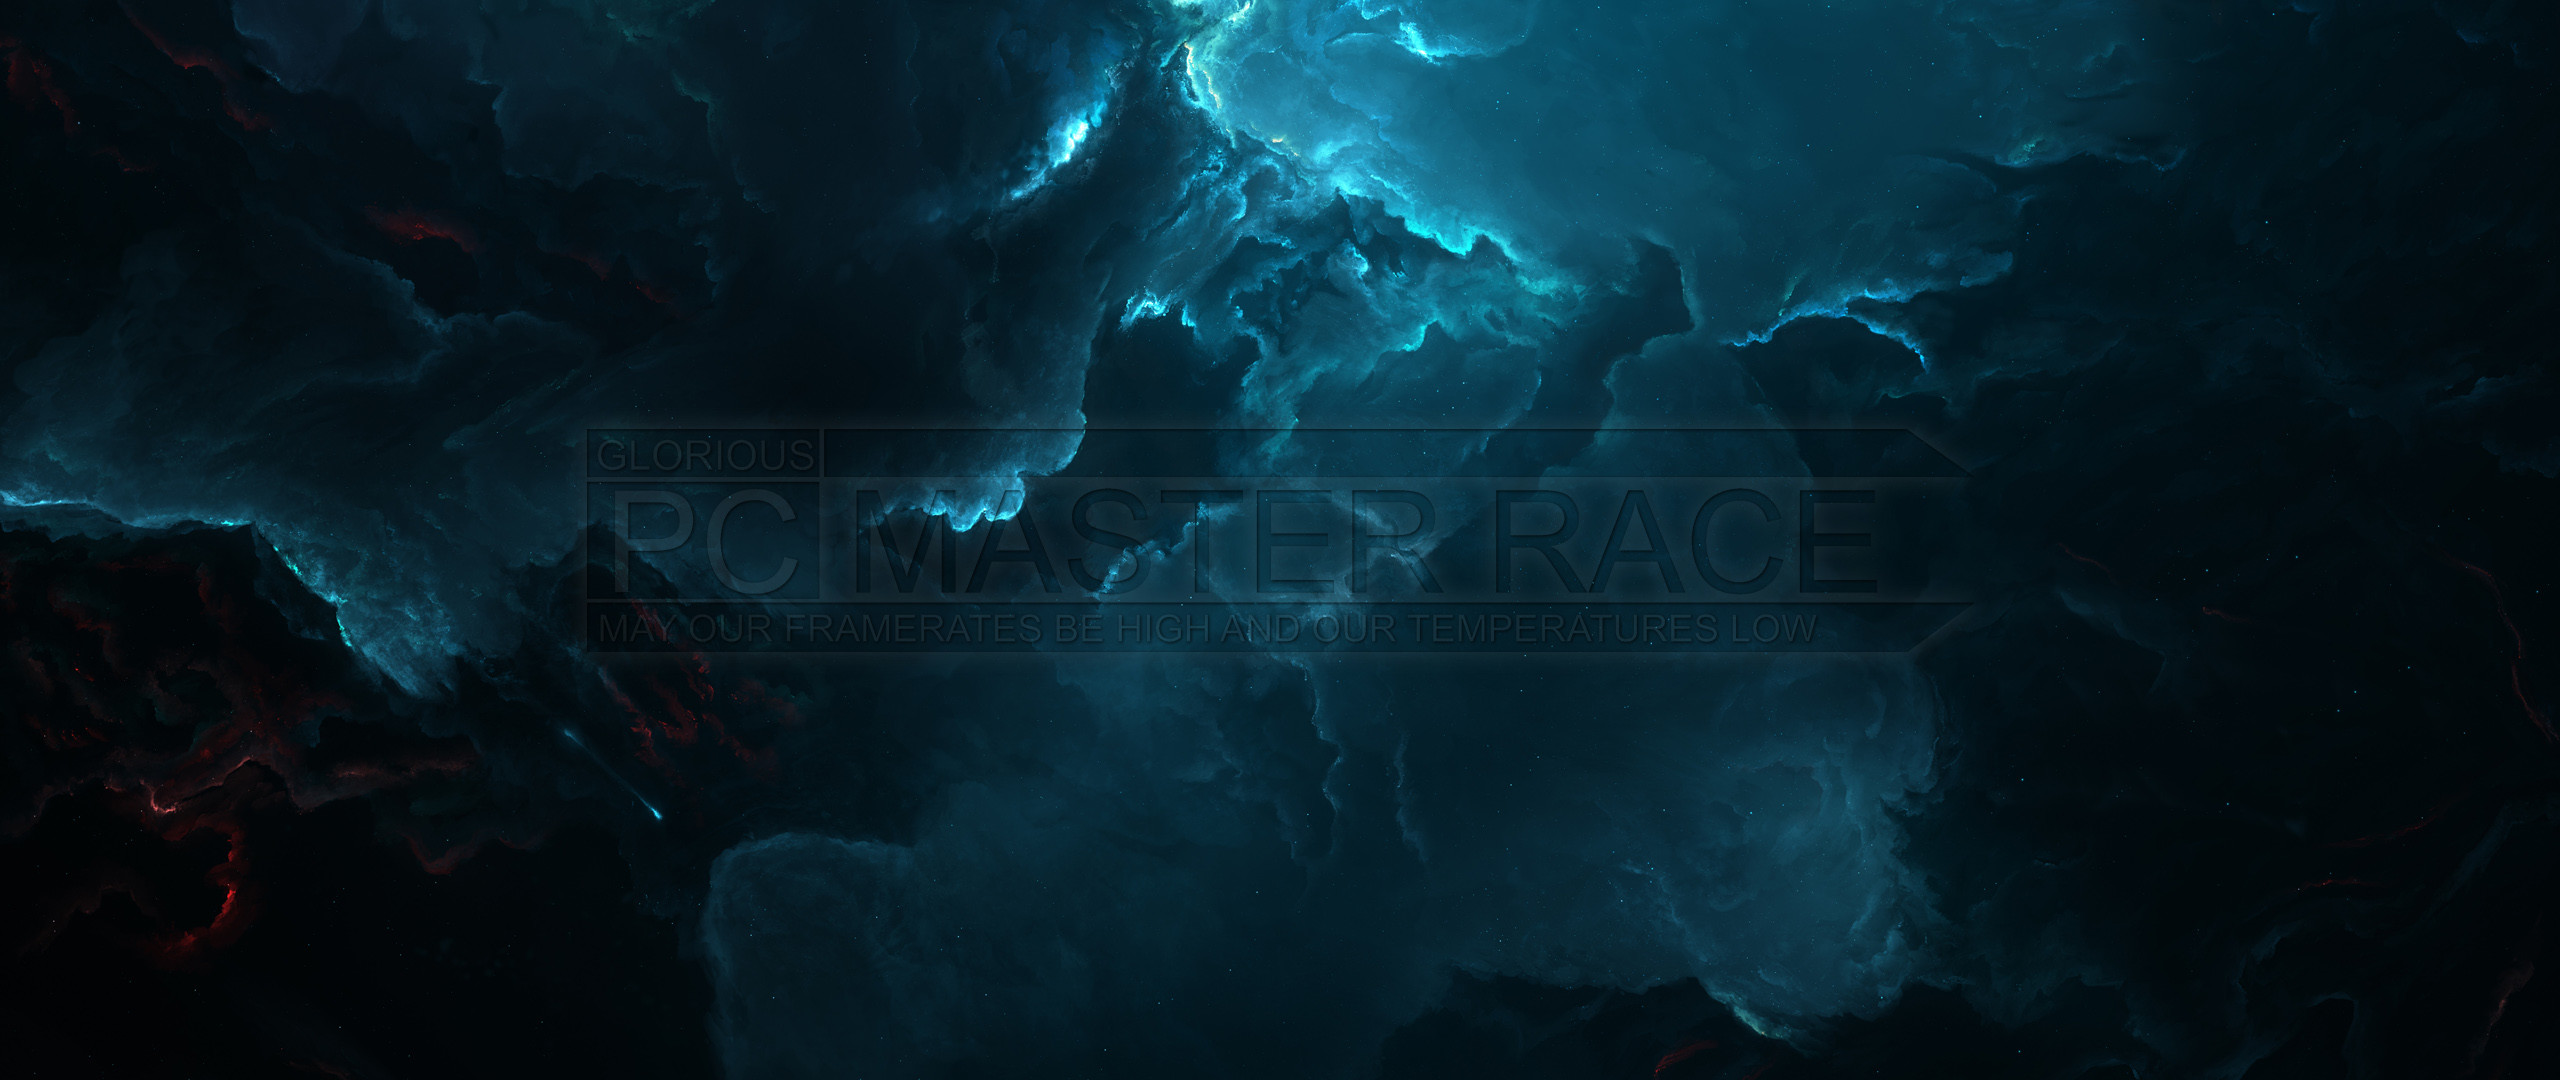 … PC Master Race ultrawide wallpaper by Nidrax